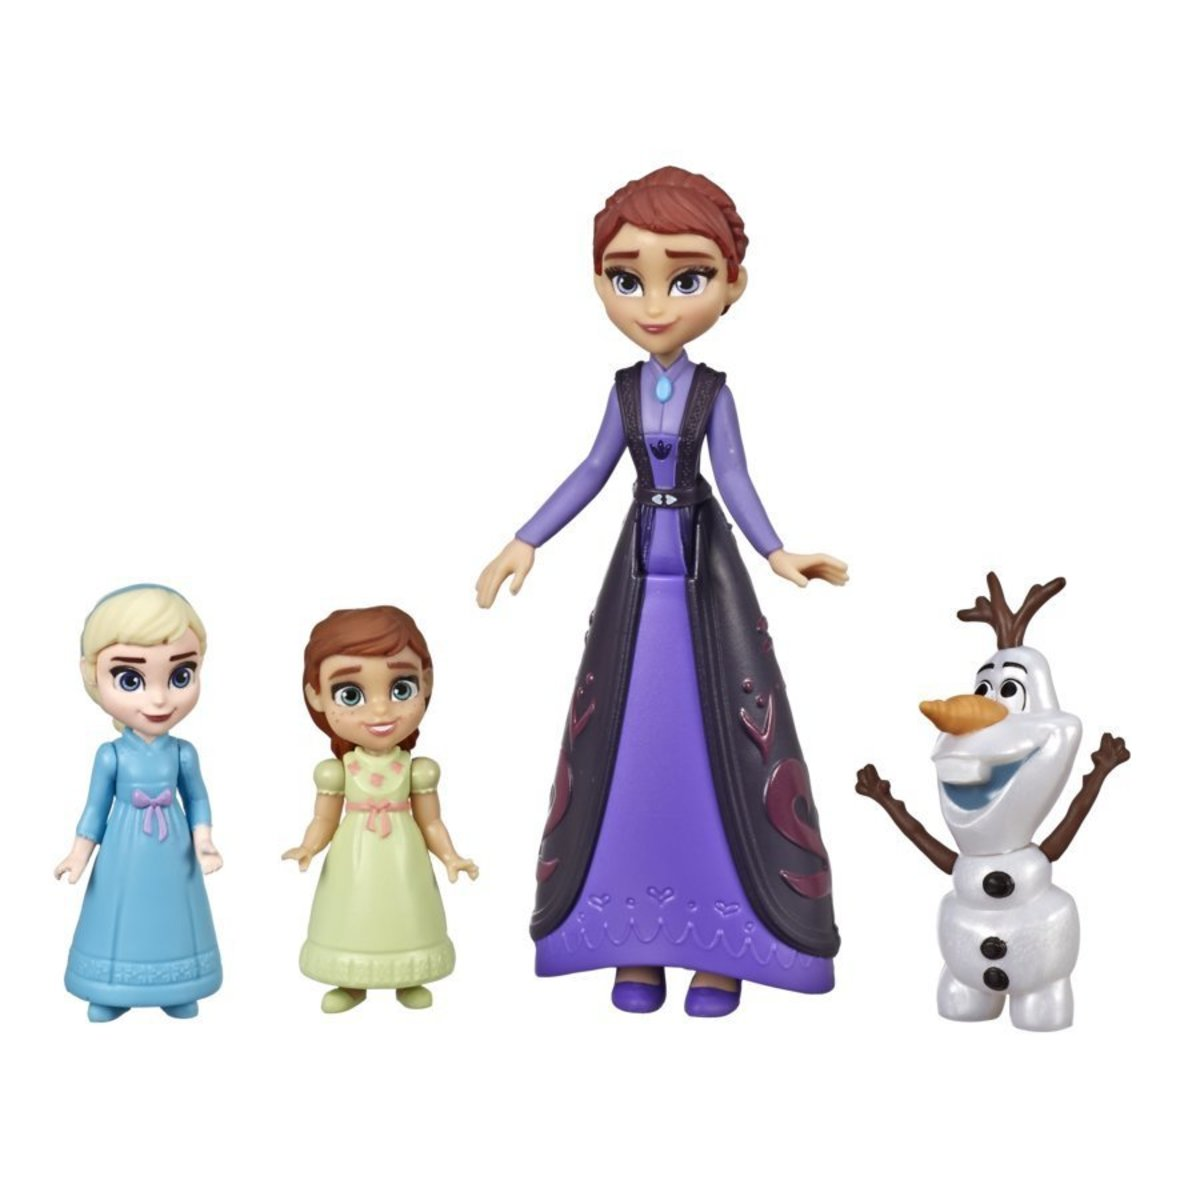 New Disney Elsa /& Anna Frozen Board Includes Dry Eraser with Pen Notice Message